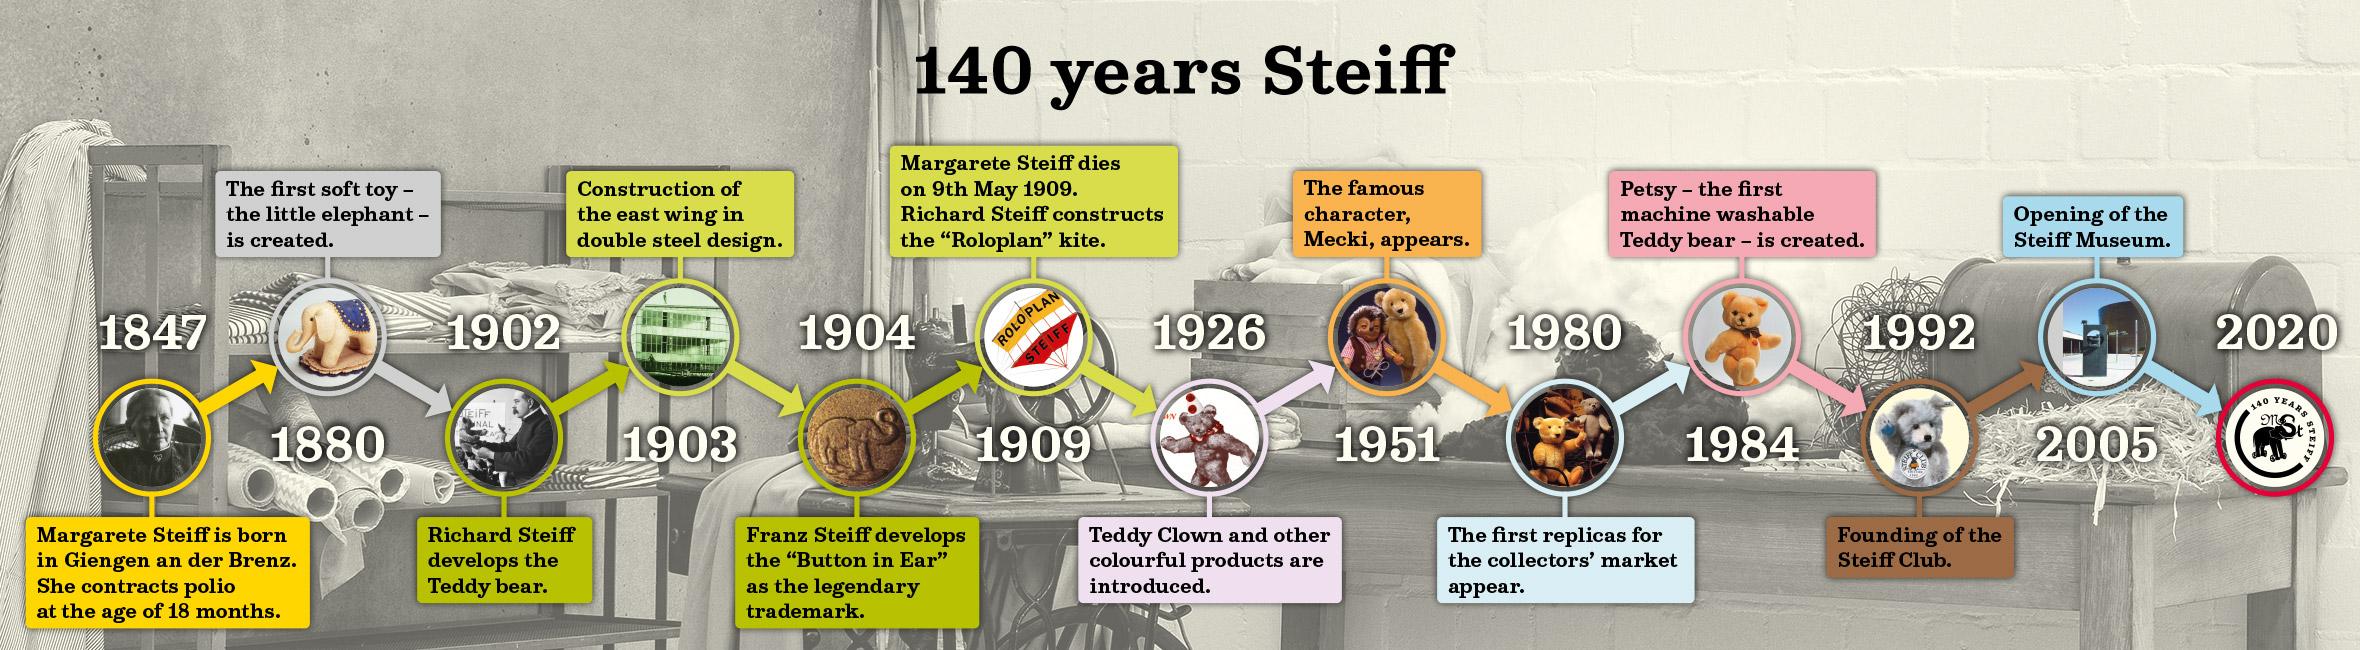 140-years-steiff-banner-horizontal.jpg